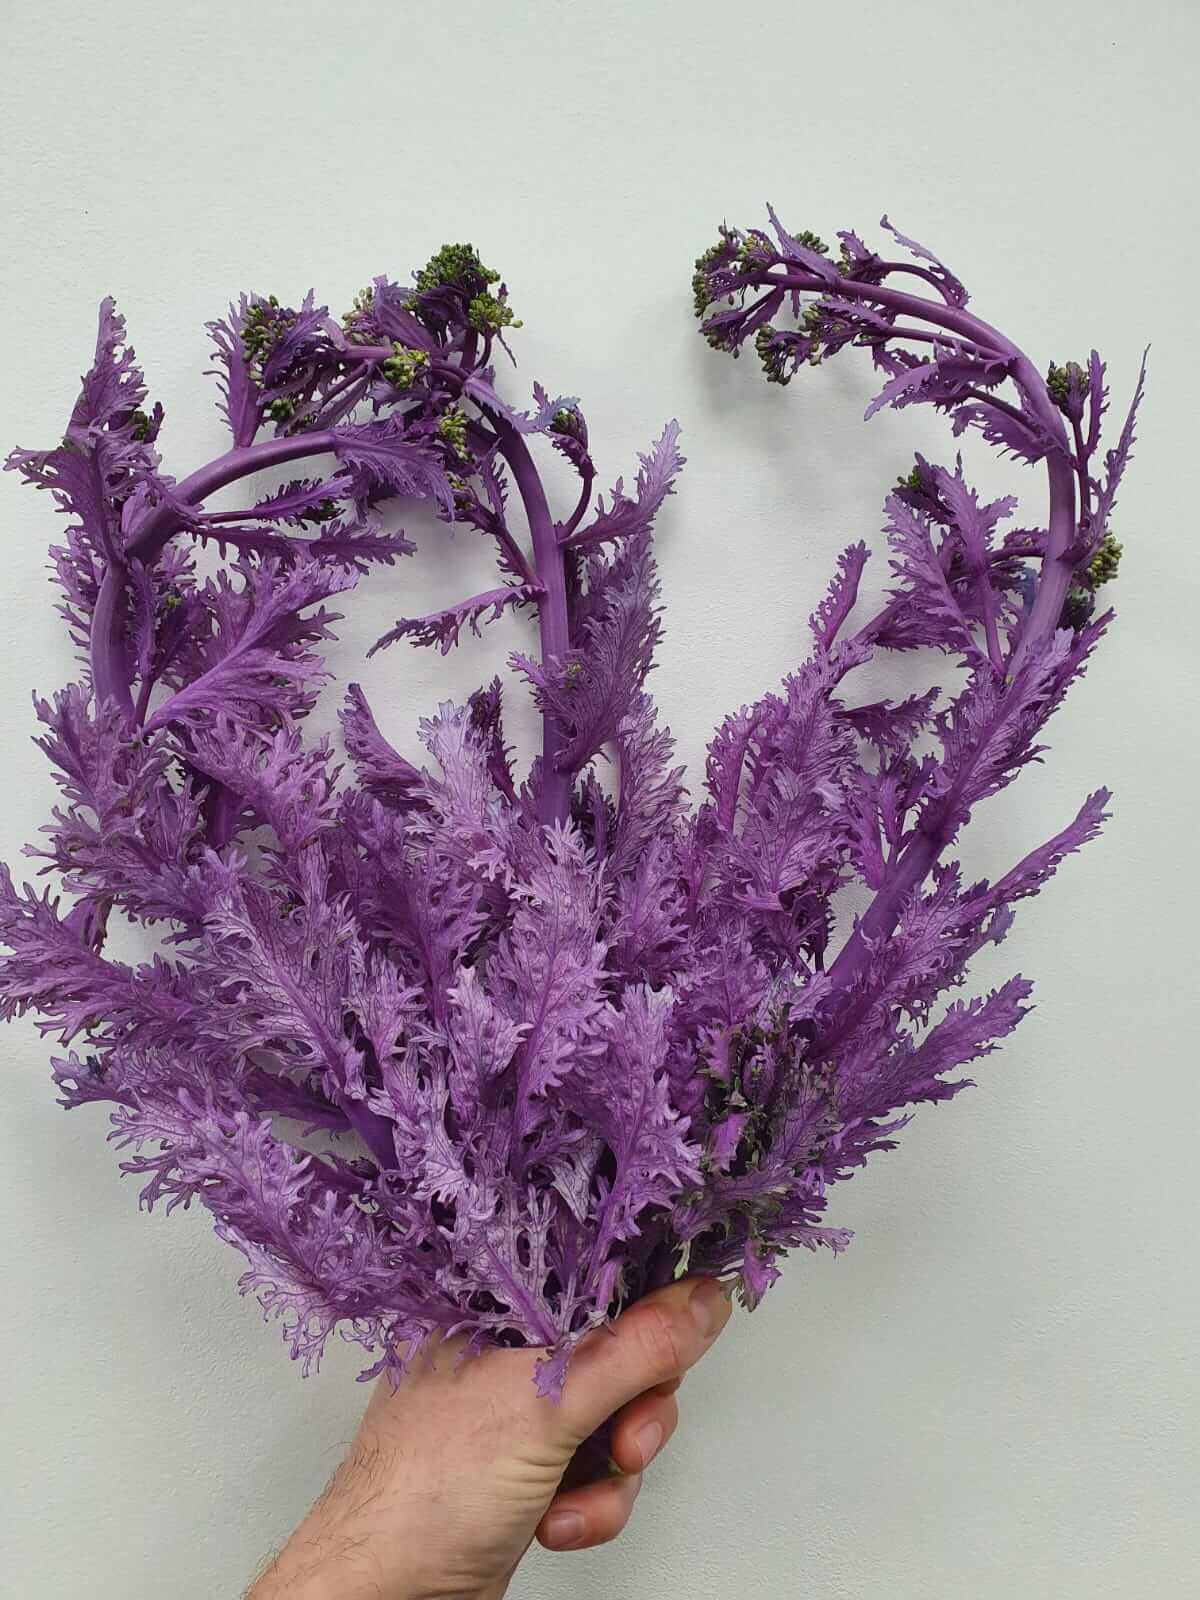 Broccoli Winter Paars 2947